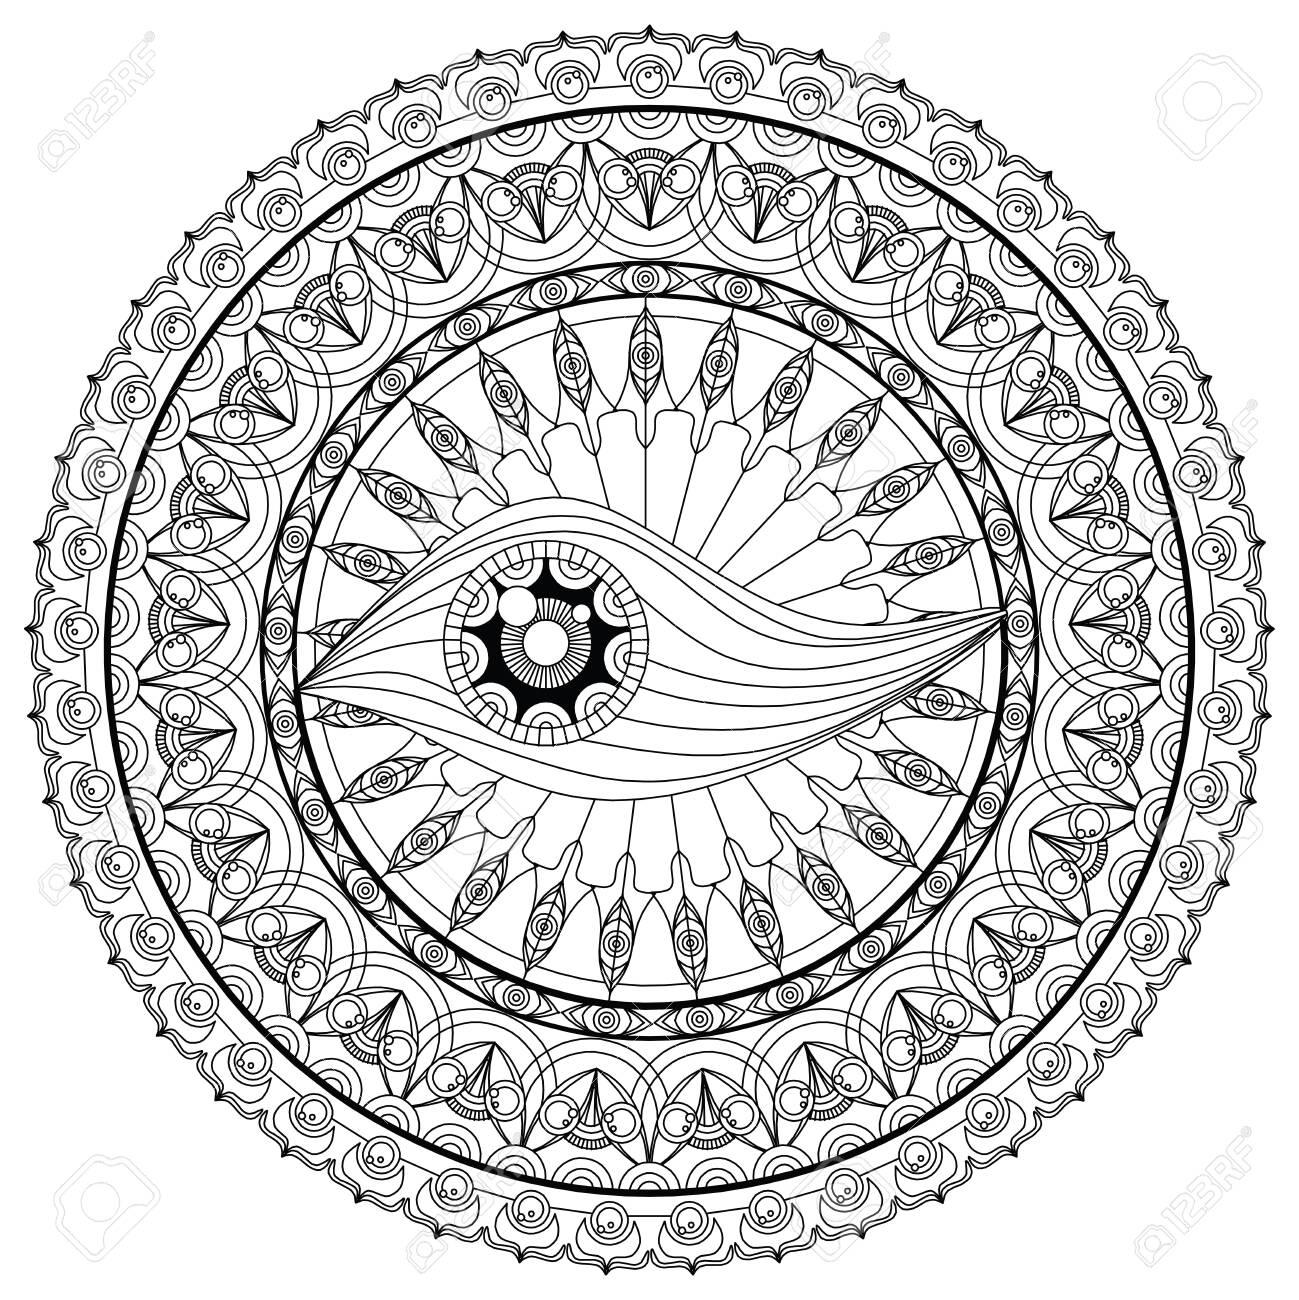 Mandala Coloring page For Adult Relaxation Mandala design eye..